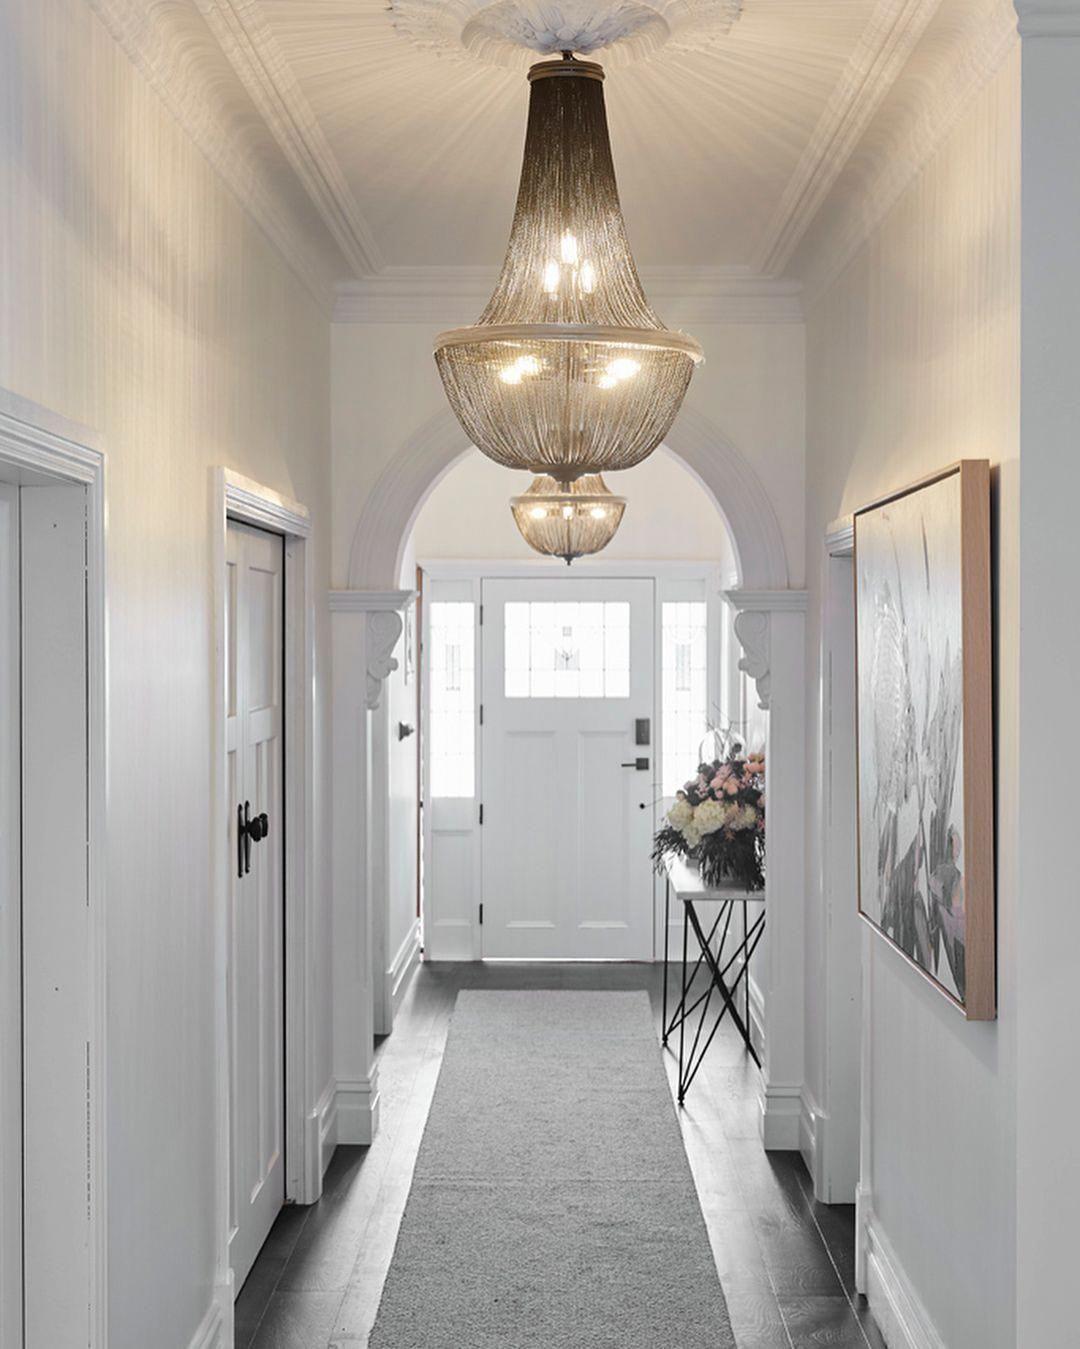 Simple Kitchens Open Kitchen Design Ideas Small Designs: Narrow Hallway Decorating, Small Hallways